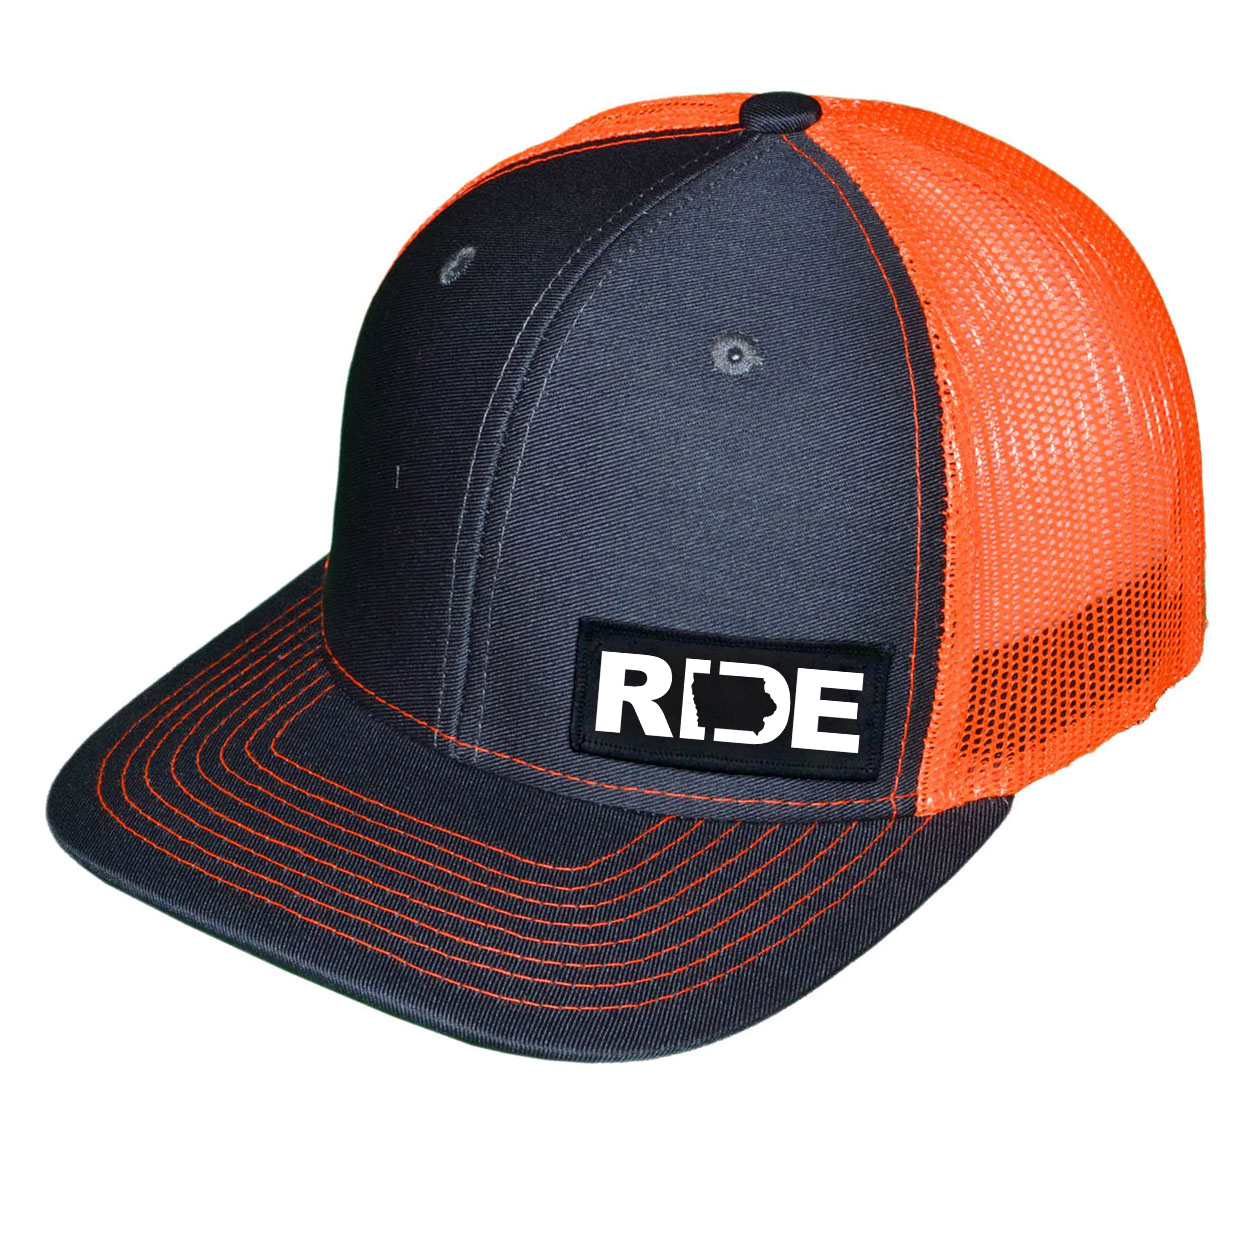 Ride Iowa Night Out Woven Patch Snapback Trucker Hat Dark Gray/Orange (White Logo)